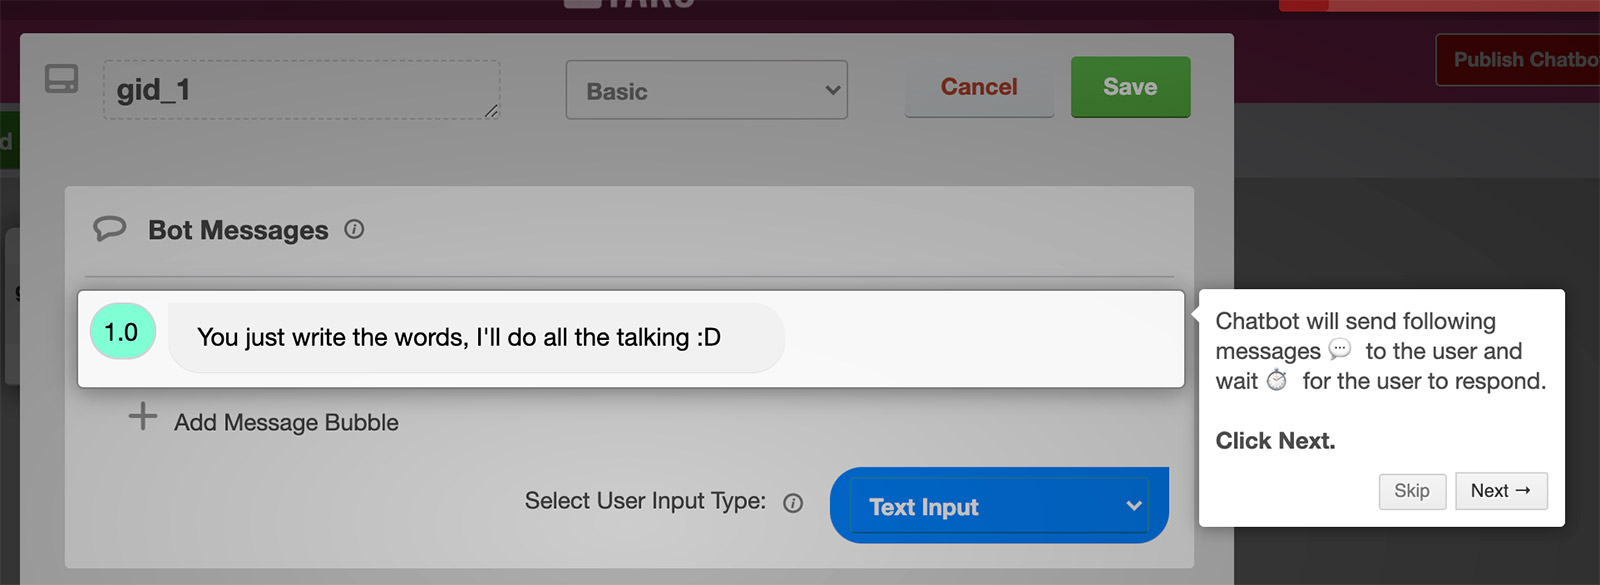 tars-bot-message